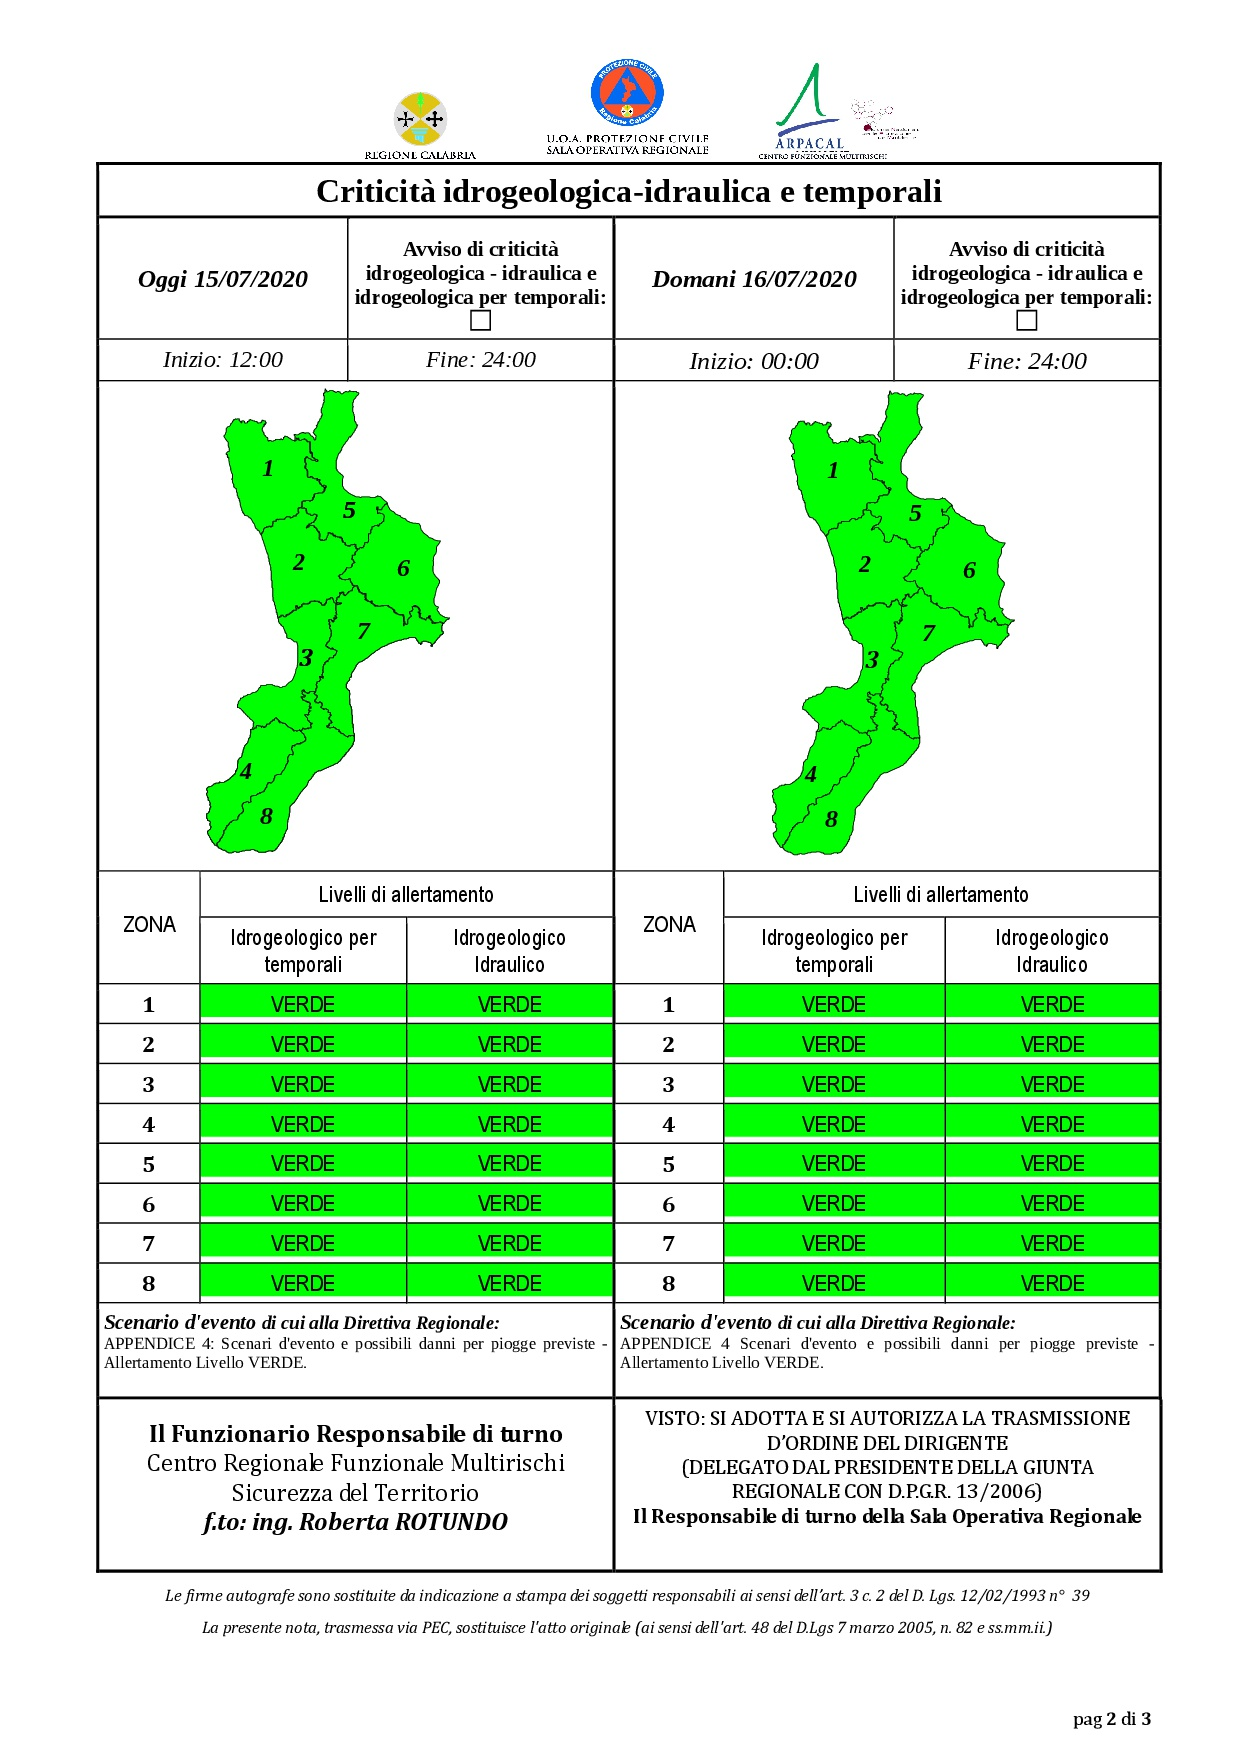 Criticità idrogeologica-idraulica e temporali in Calabria 15-07-2020